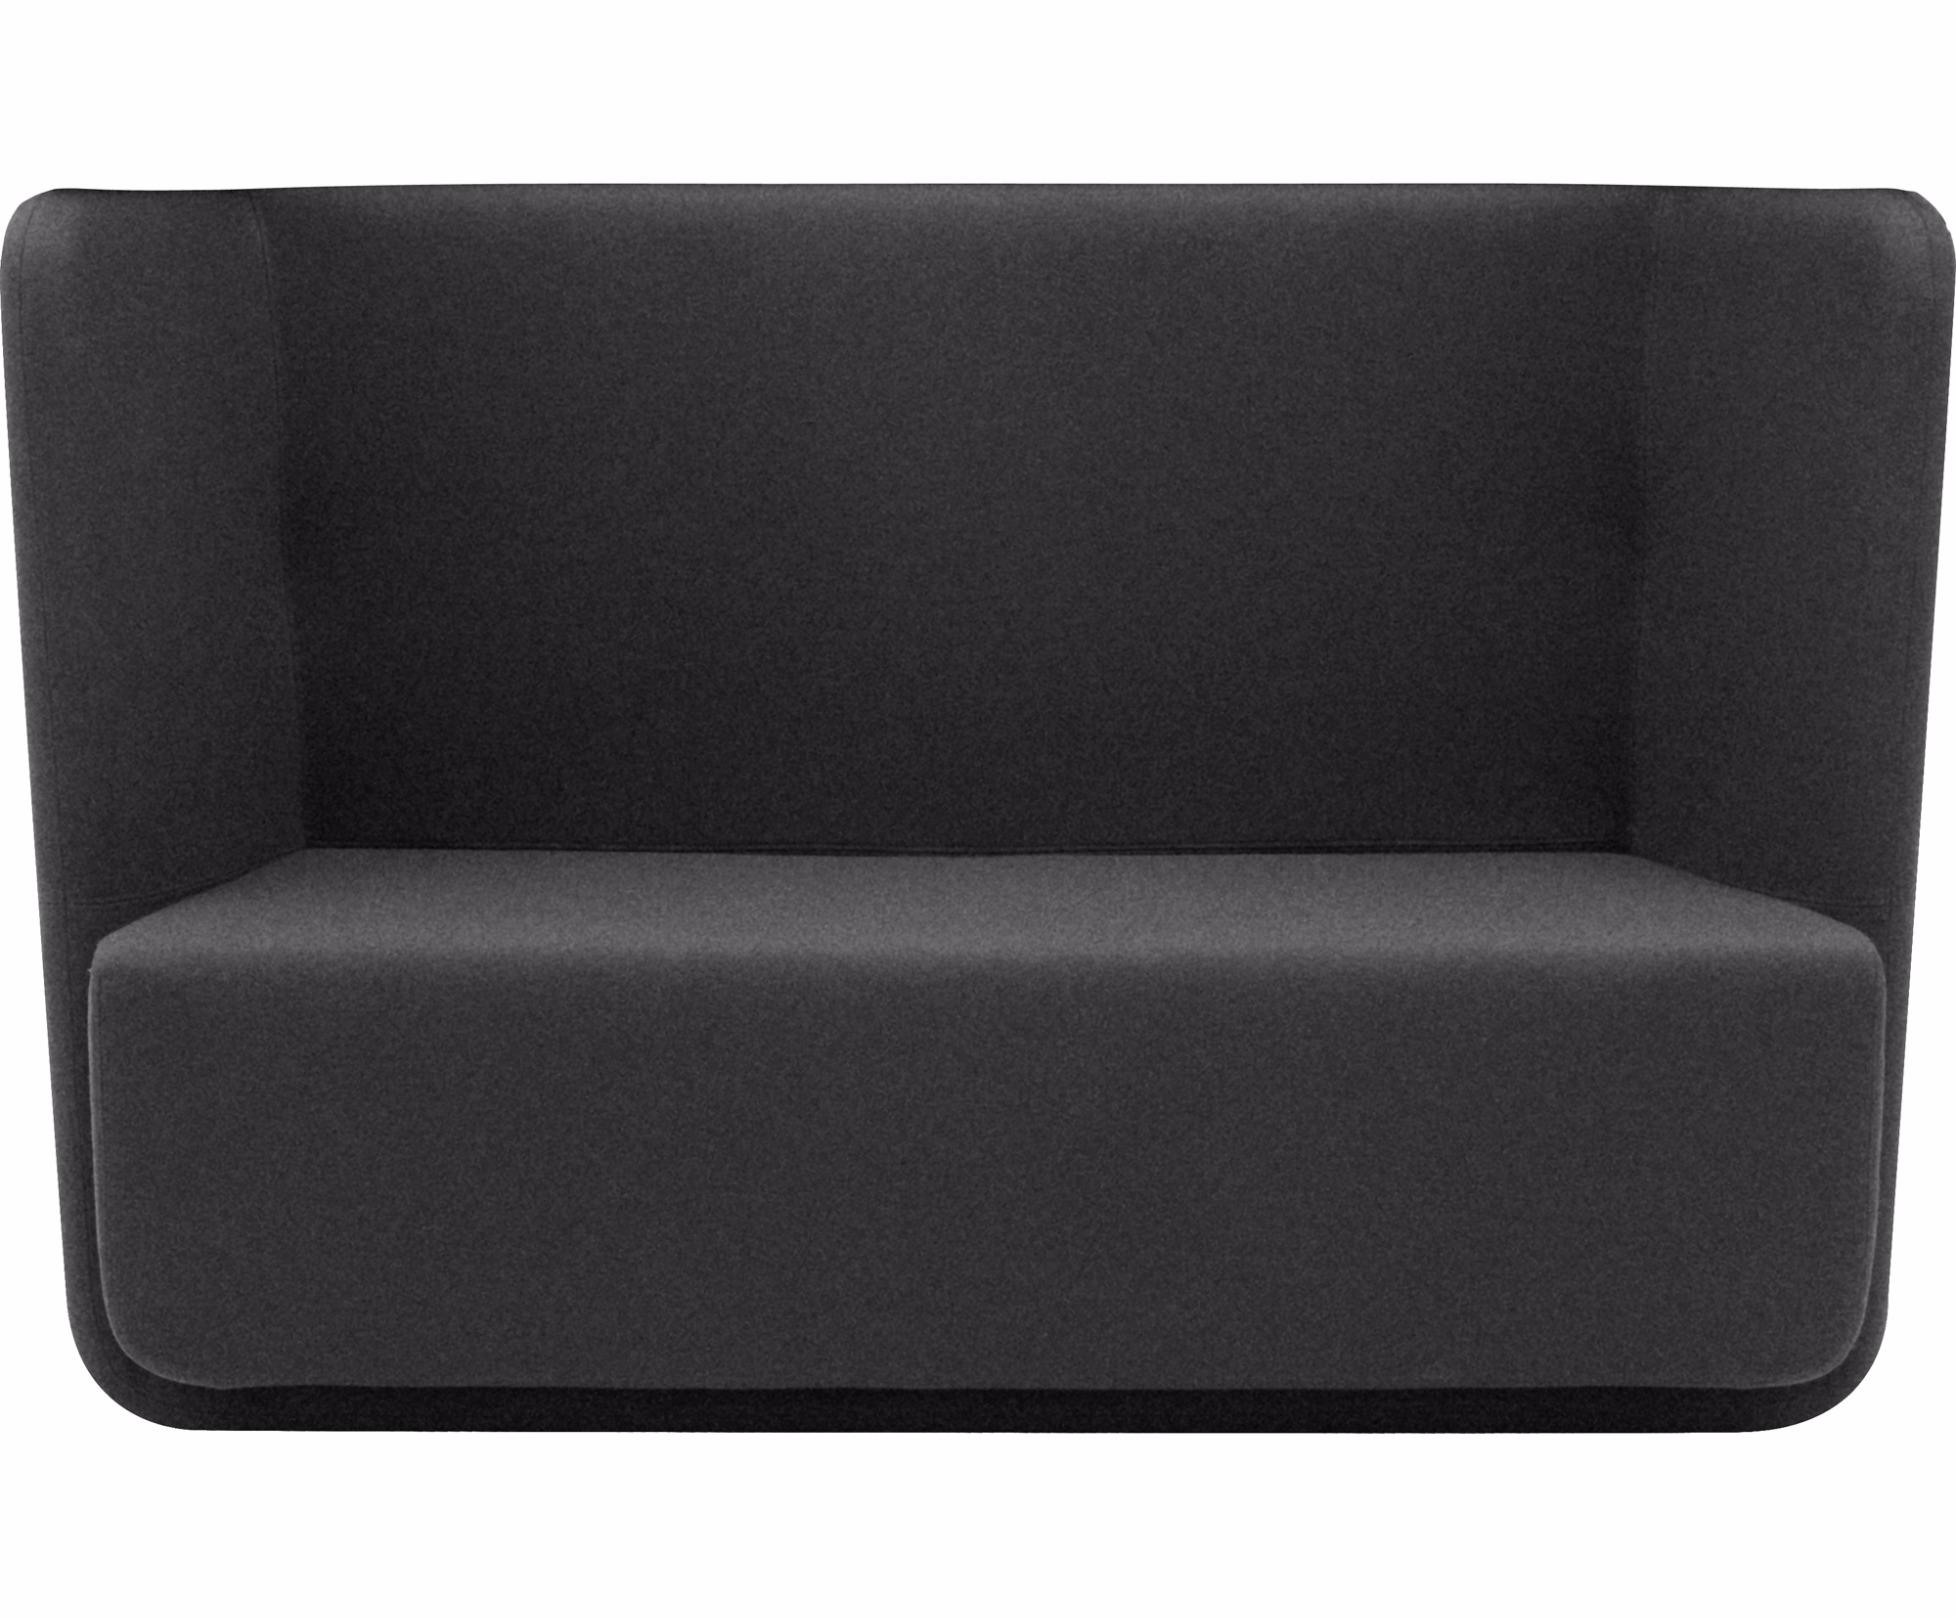 Sessel sofa niedrig von softline for Sessel niedrig